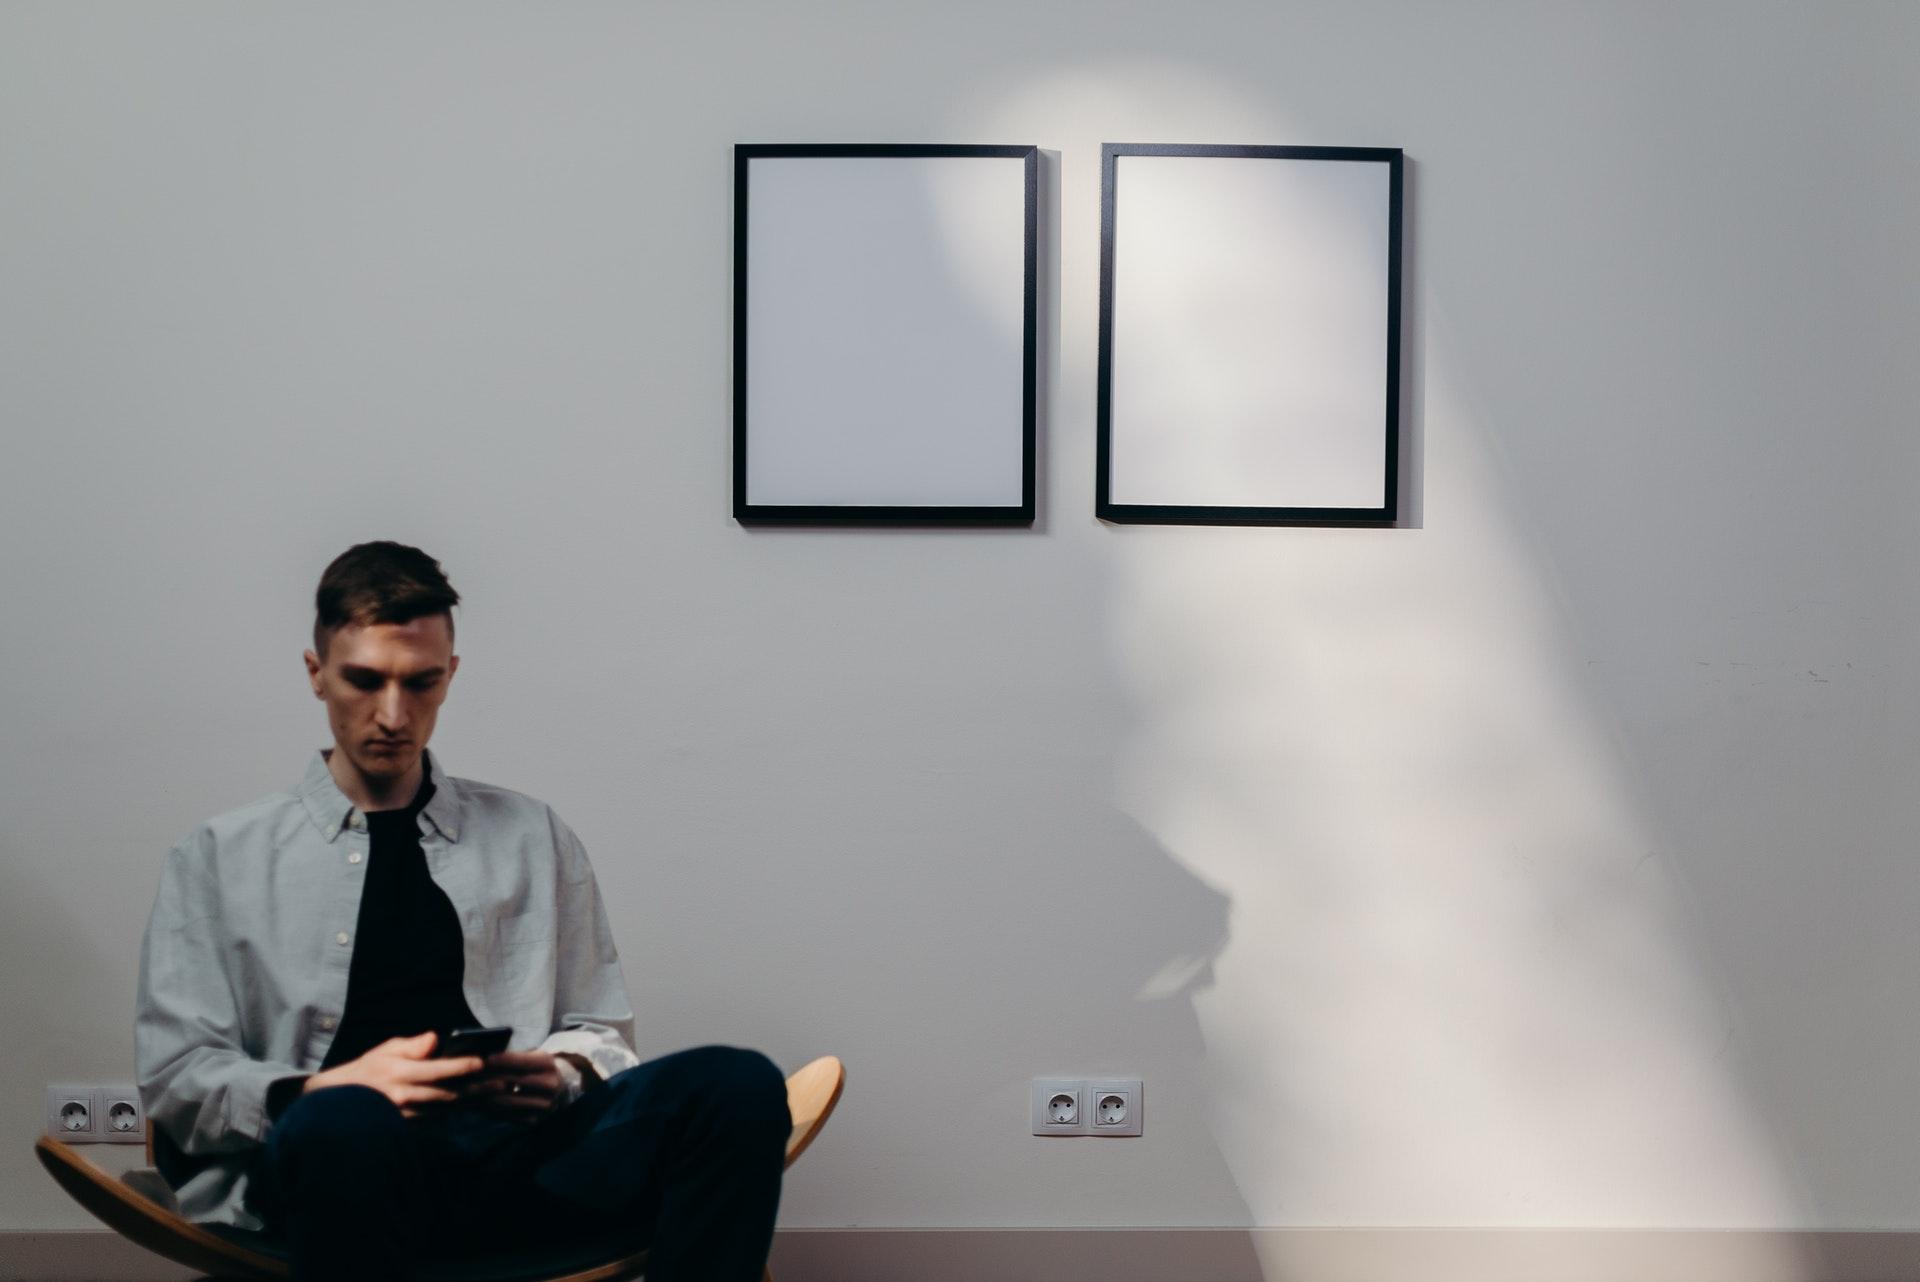 mand sidder i stol